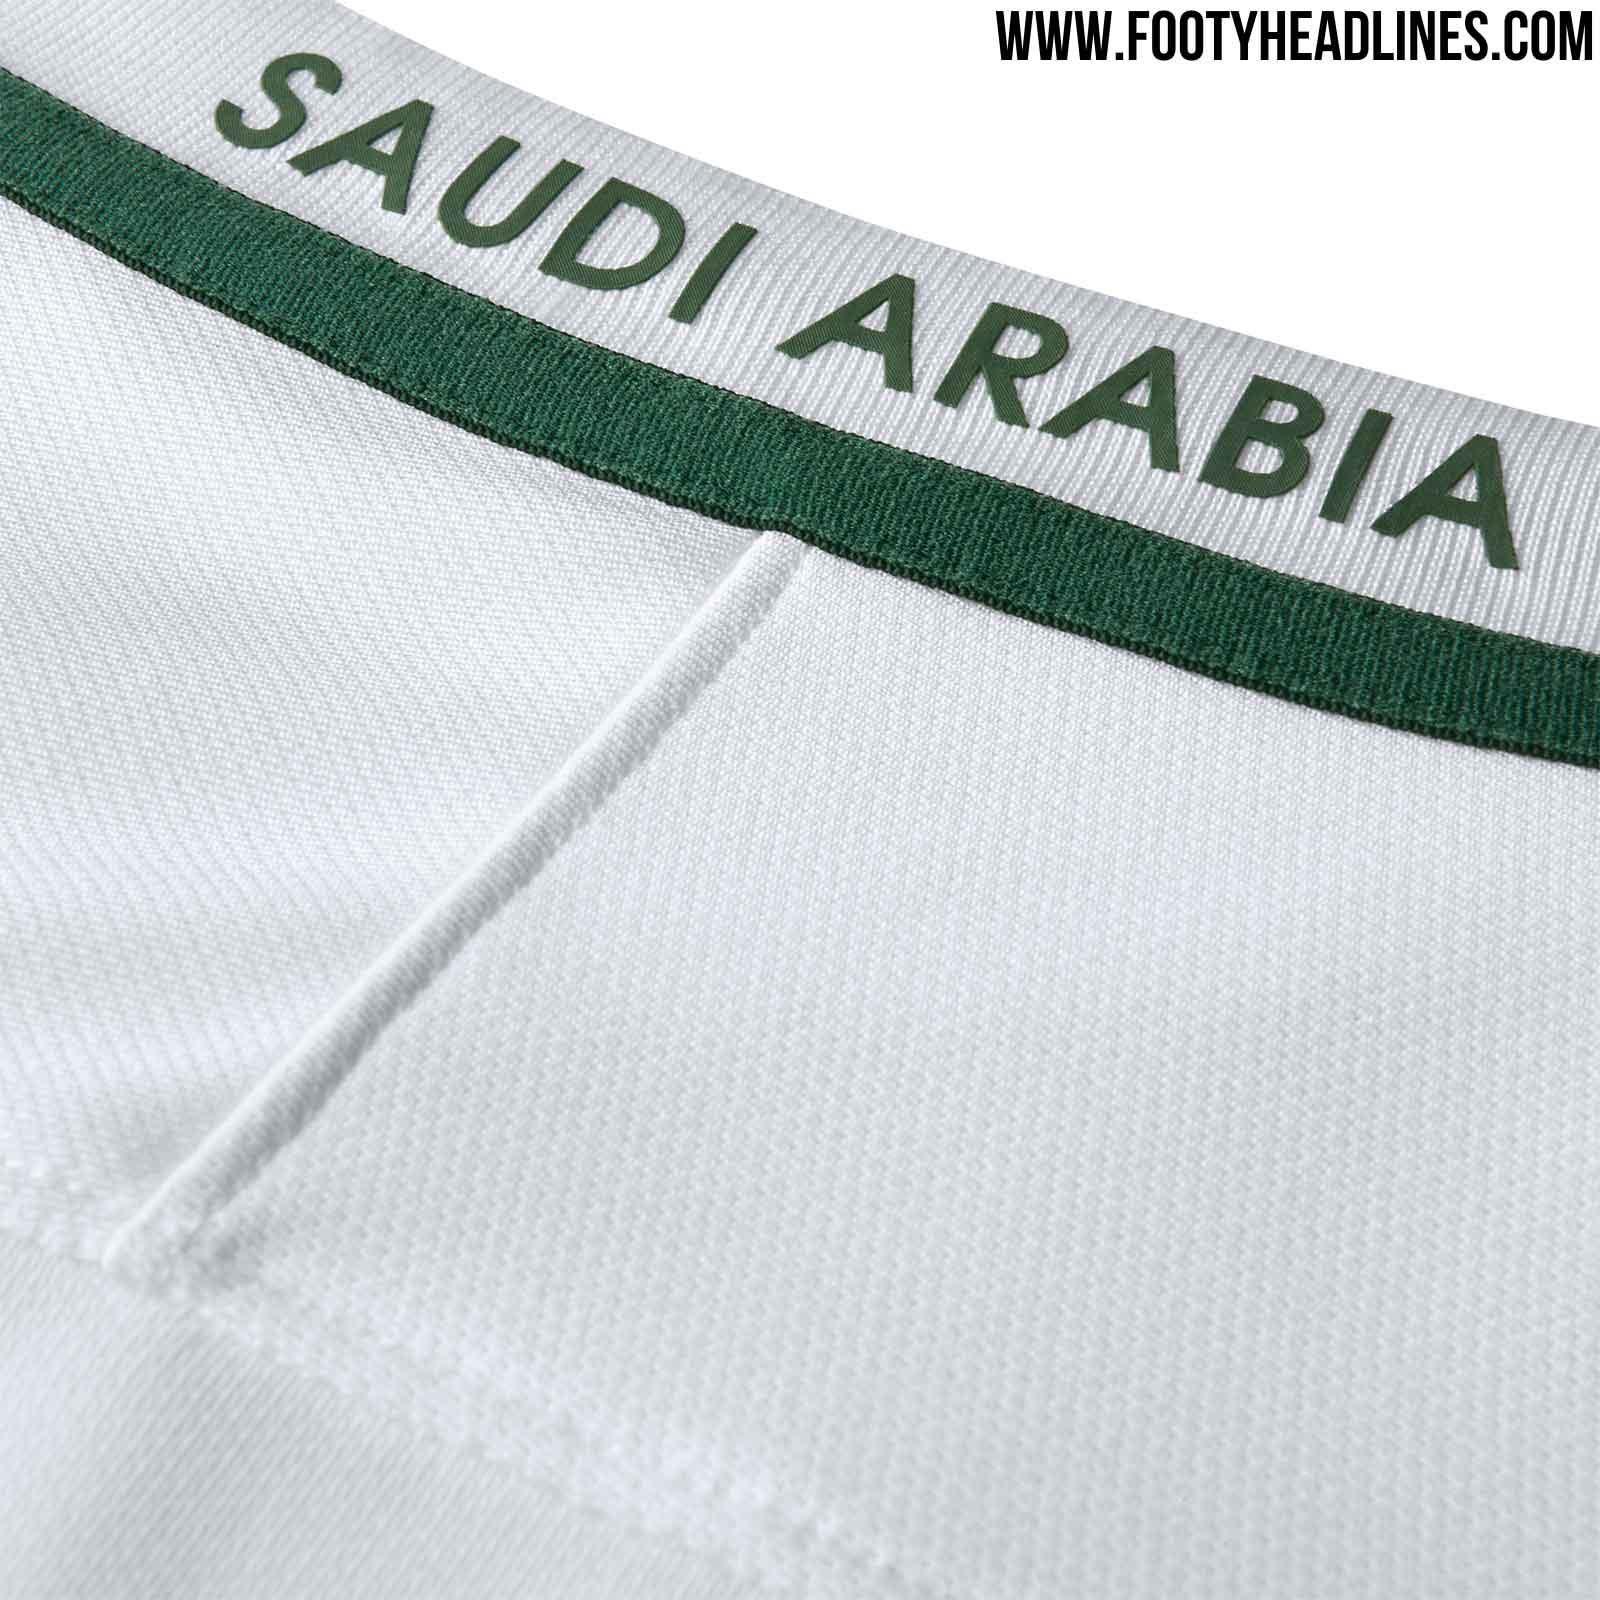 Nike jacket in saudi arabia -  1